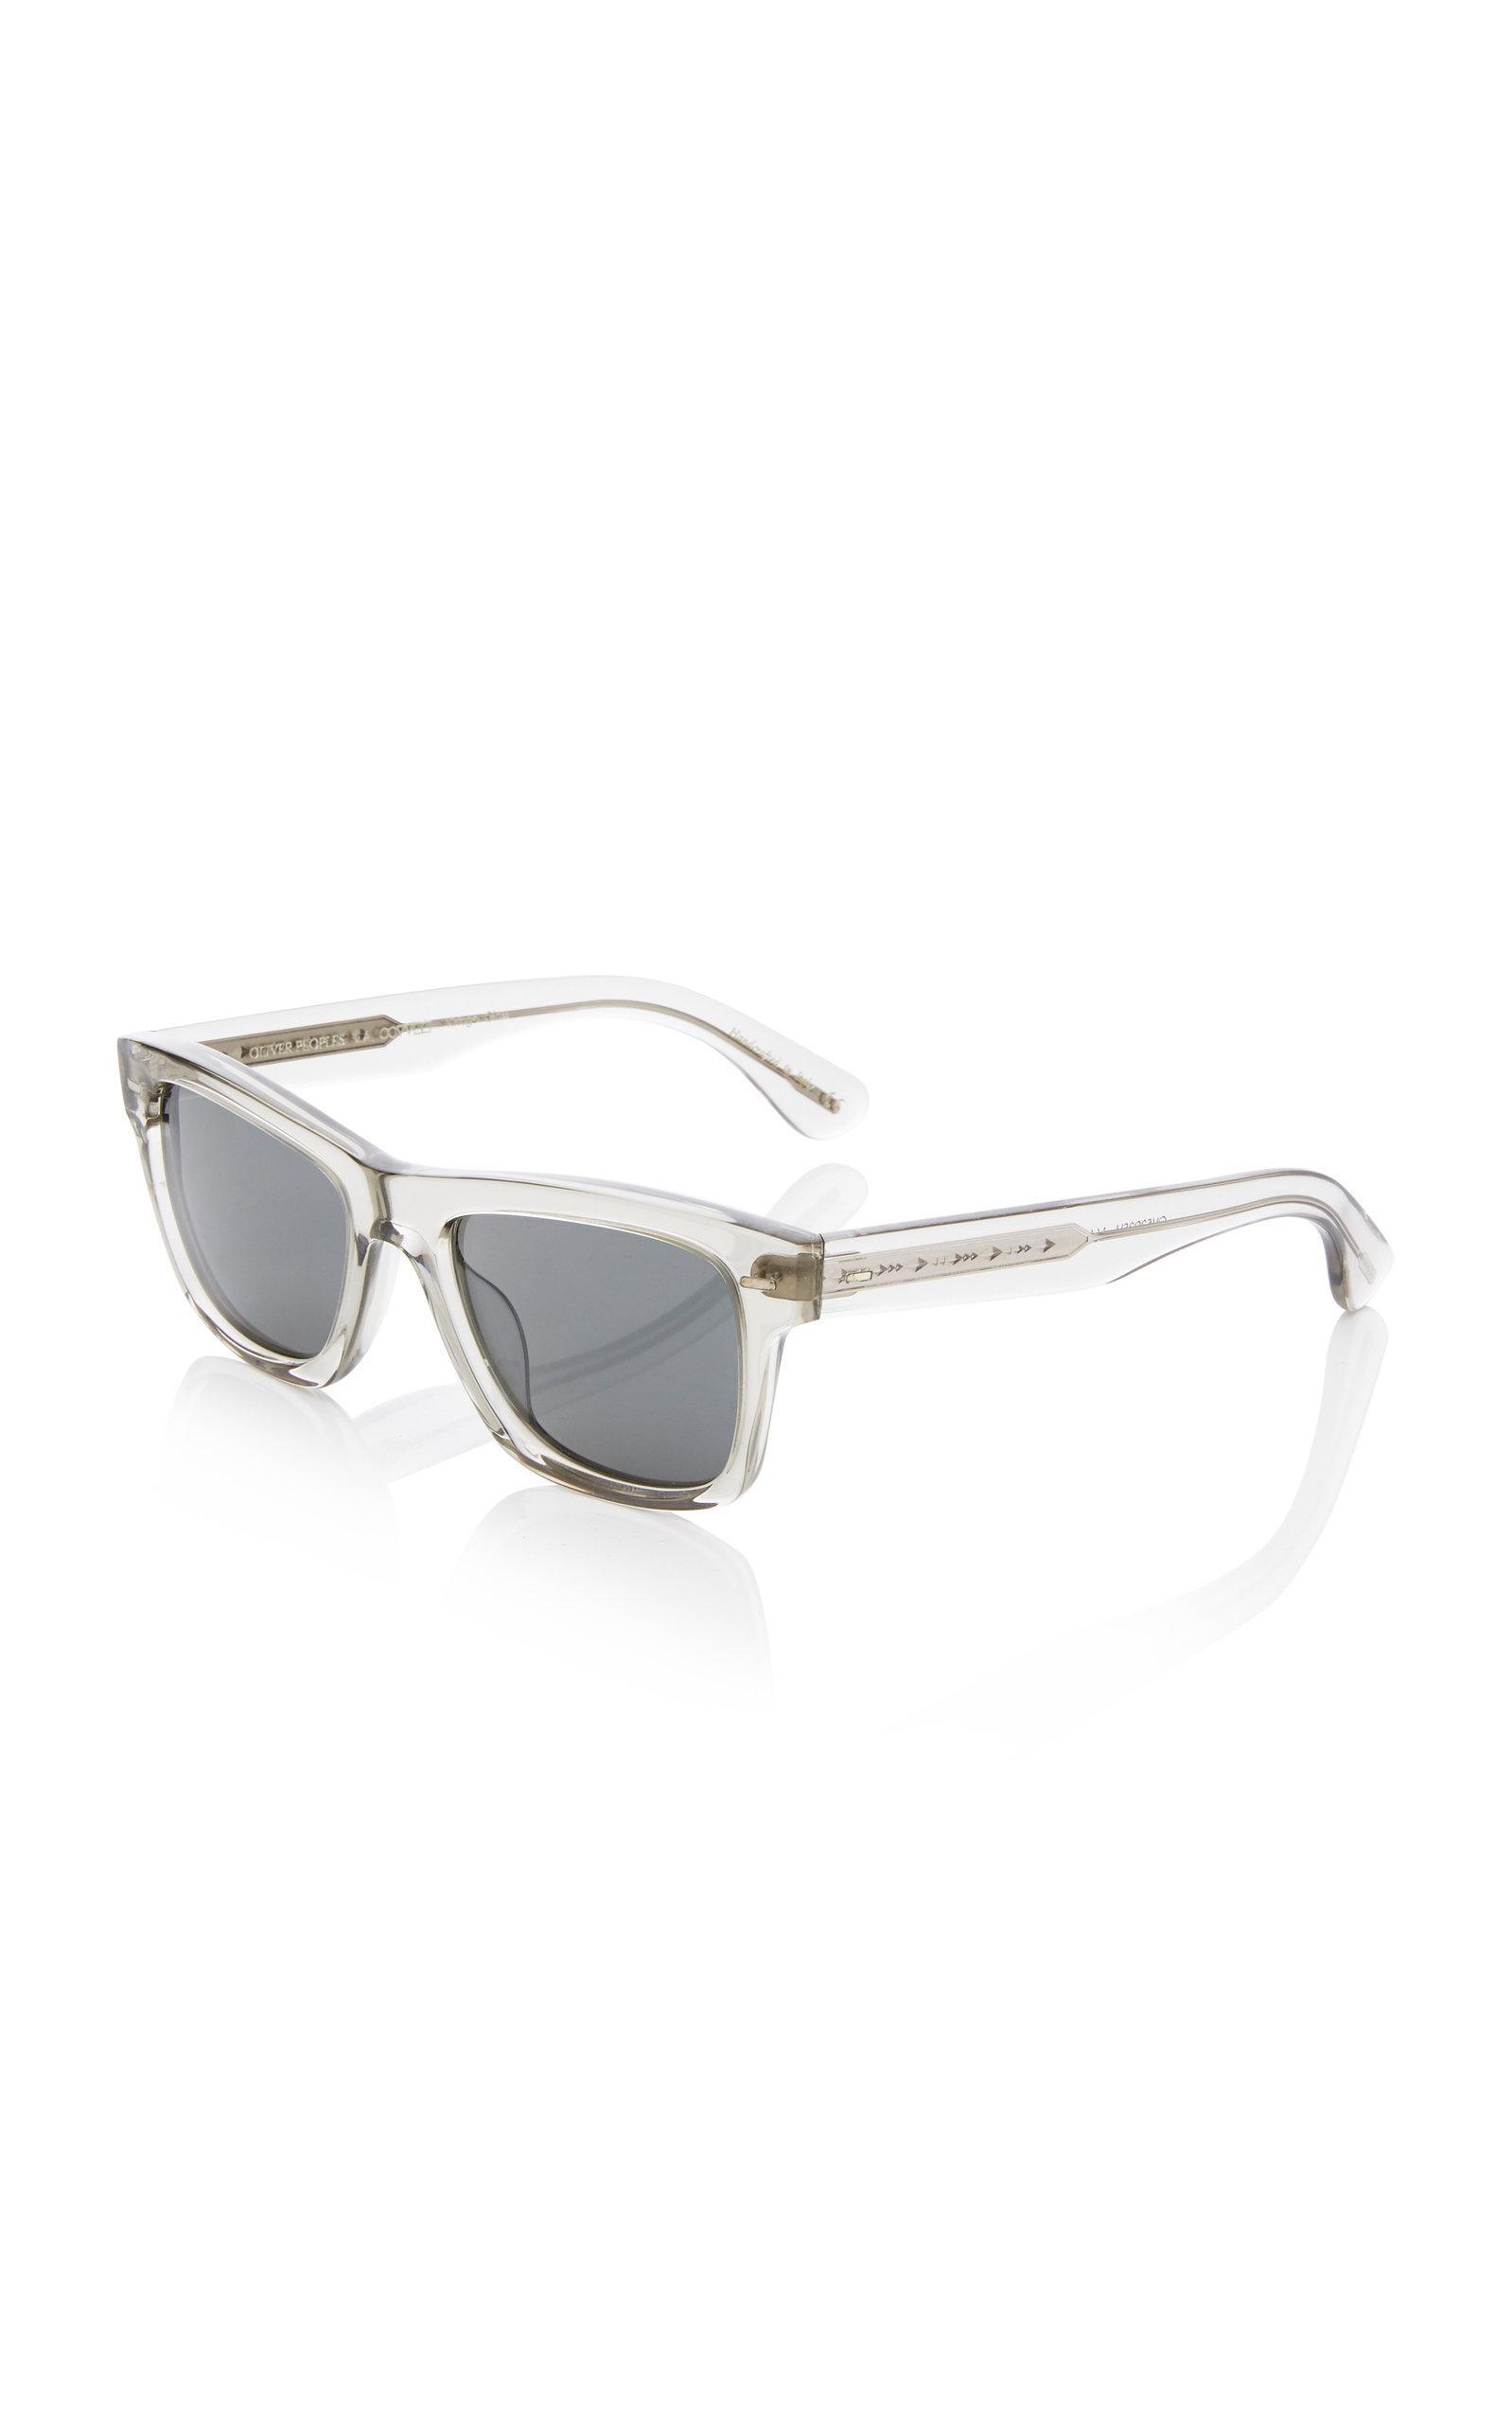 85e892728d439 Oliver Peoples - Multicolor Oliver Sun Square-frame Acetate Sunglasses for  Men - Lyst. View fullscreen